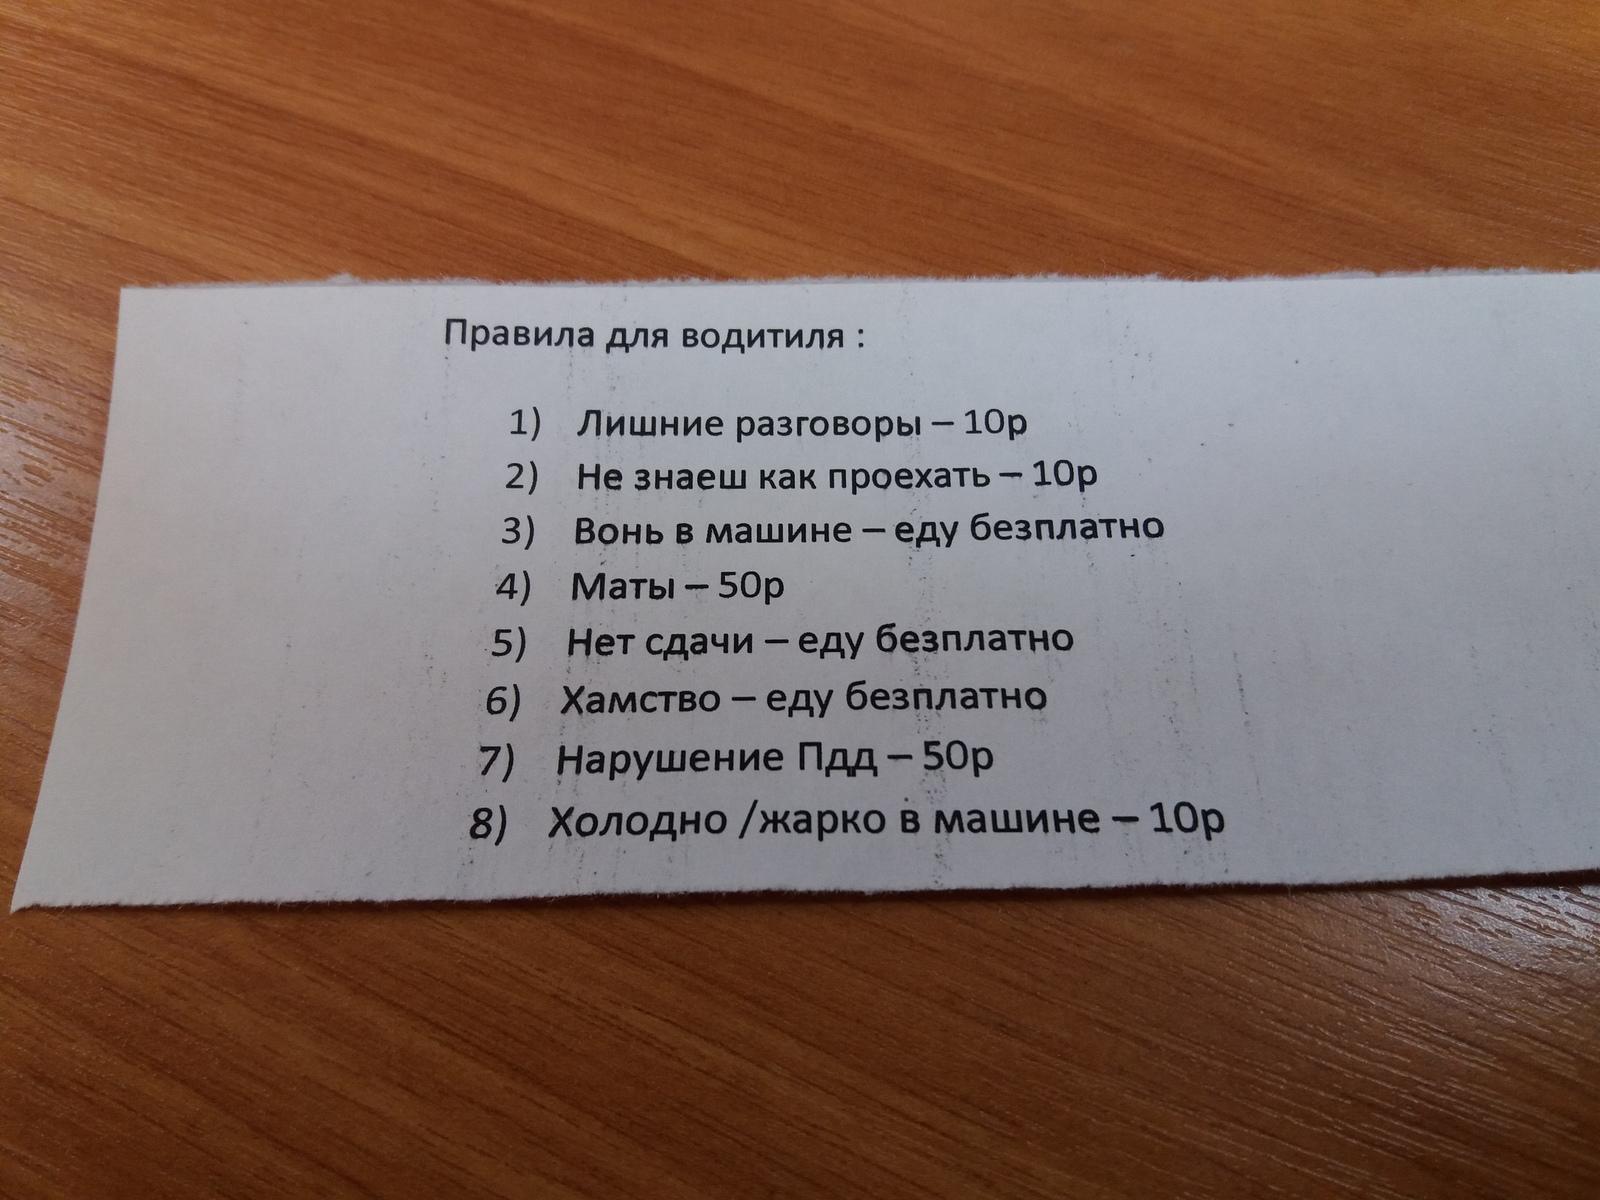 Правила водитИля